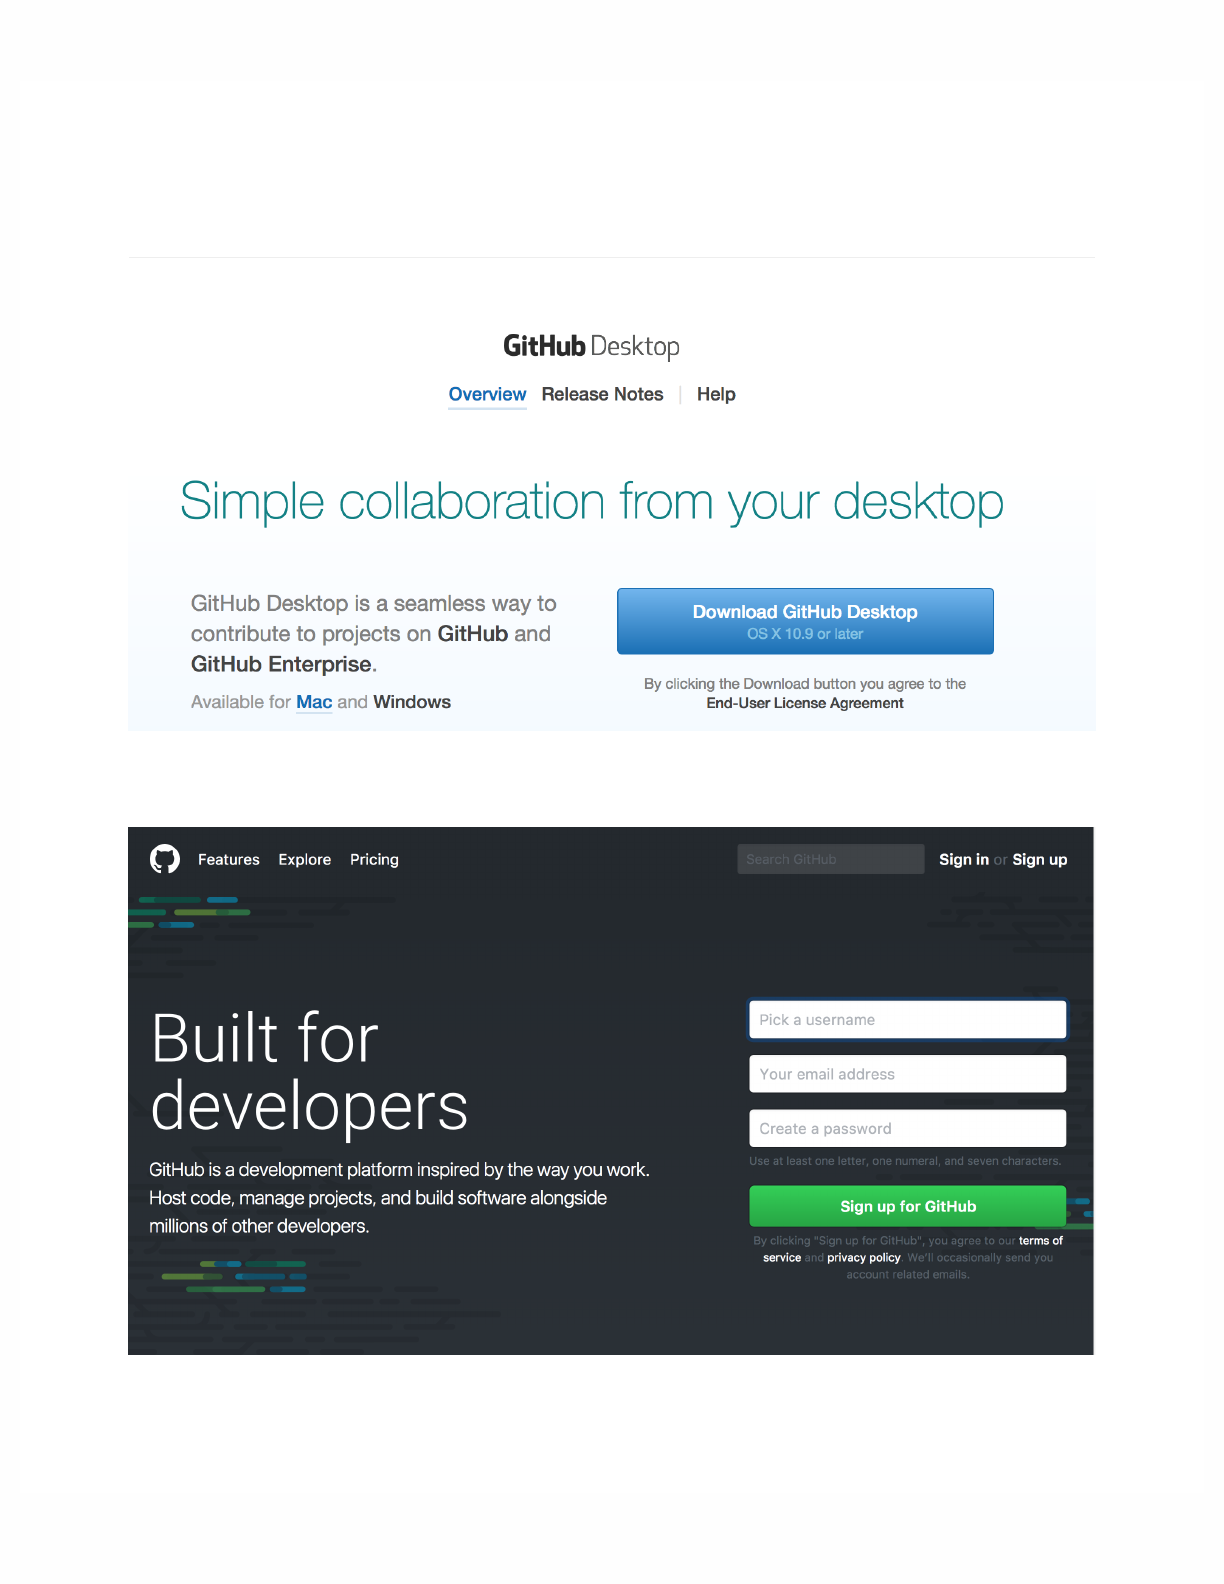 Download github desktop for mac desktop